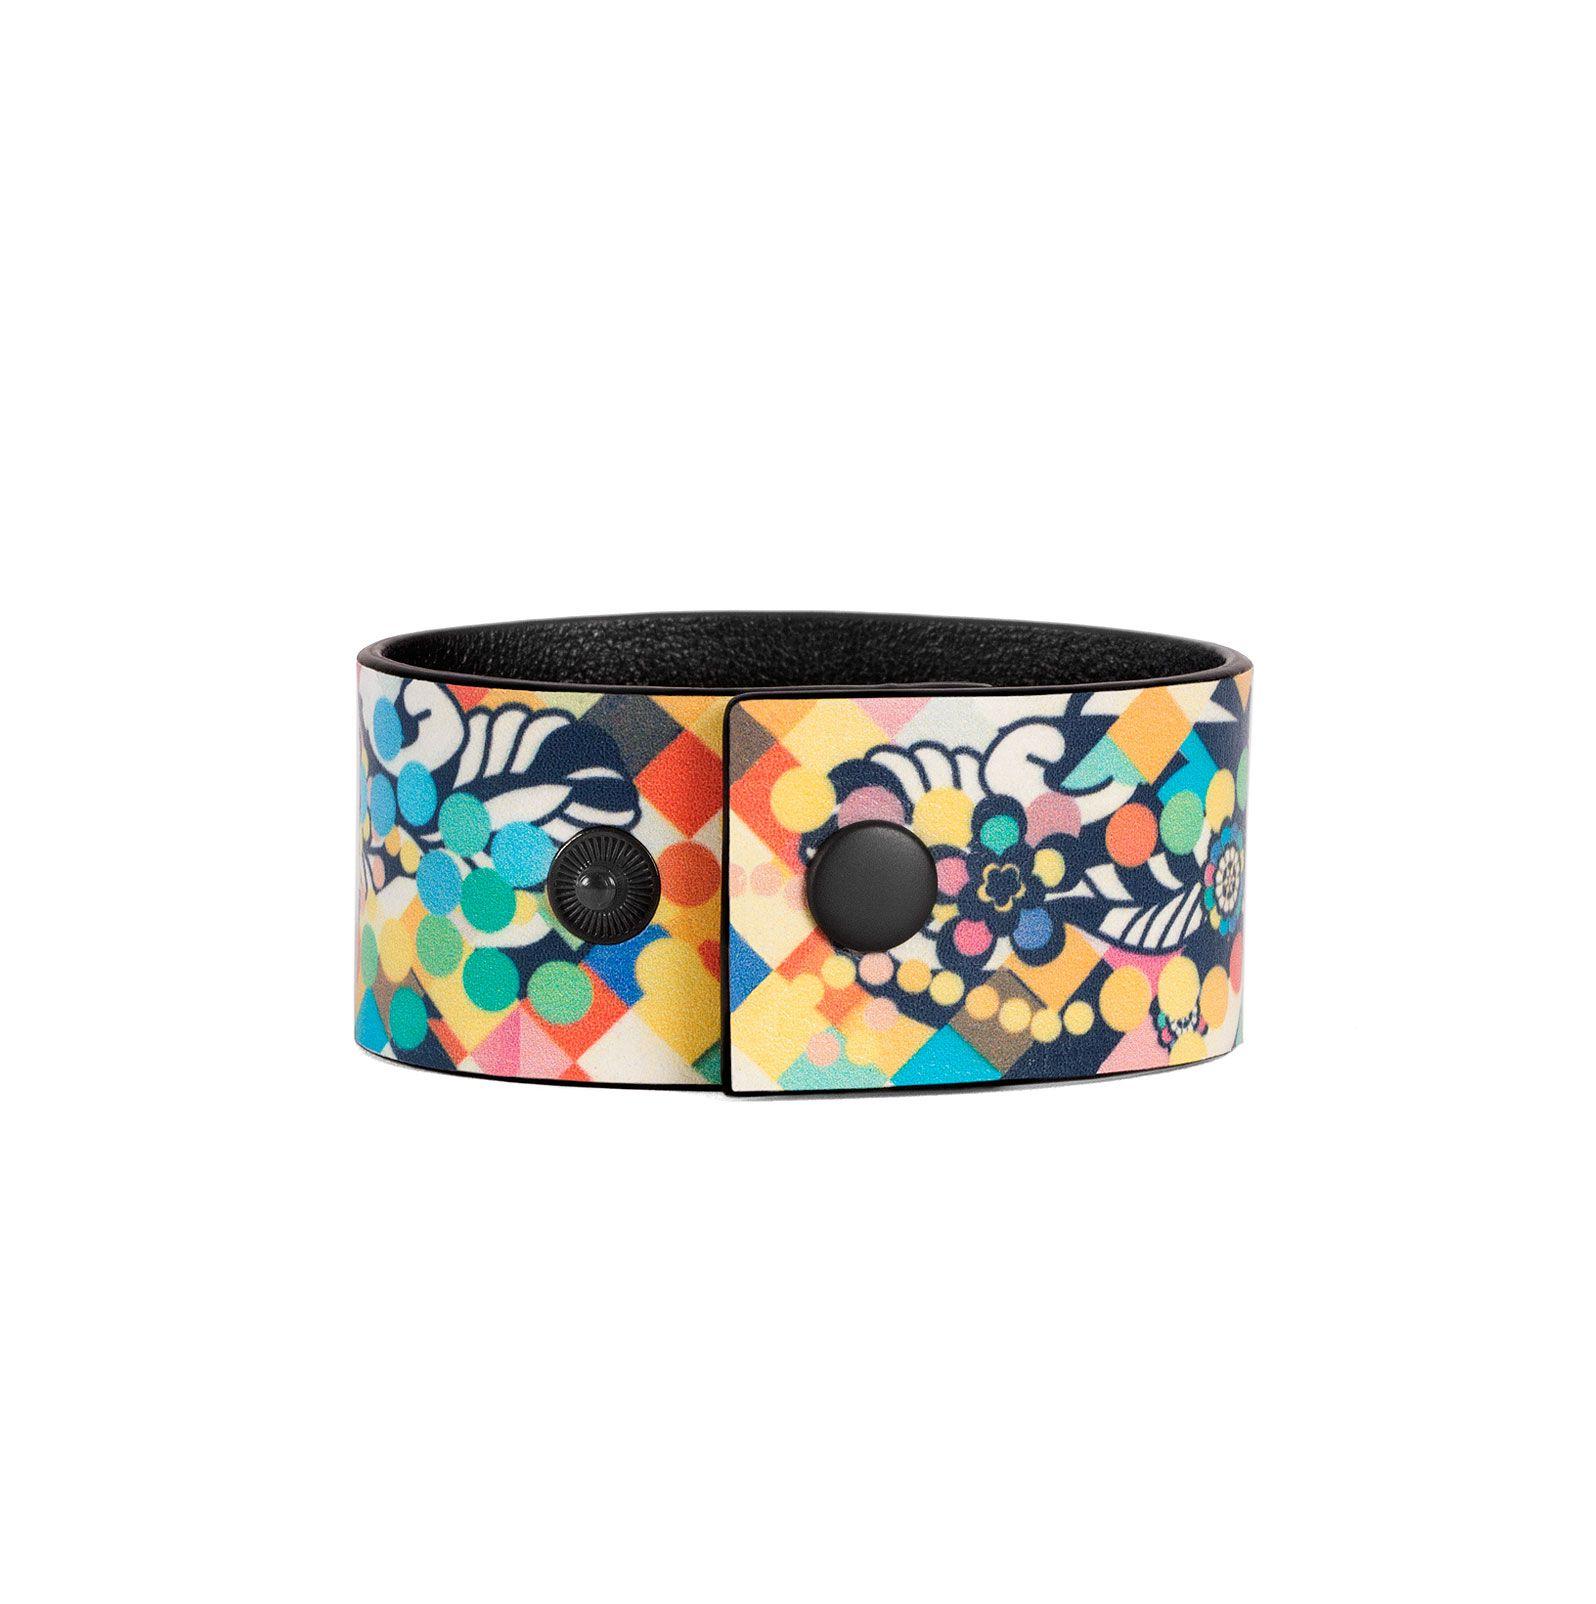 Colours of my life bracelet designer limited edition